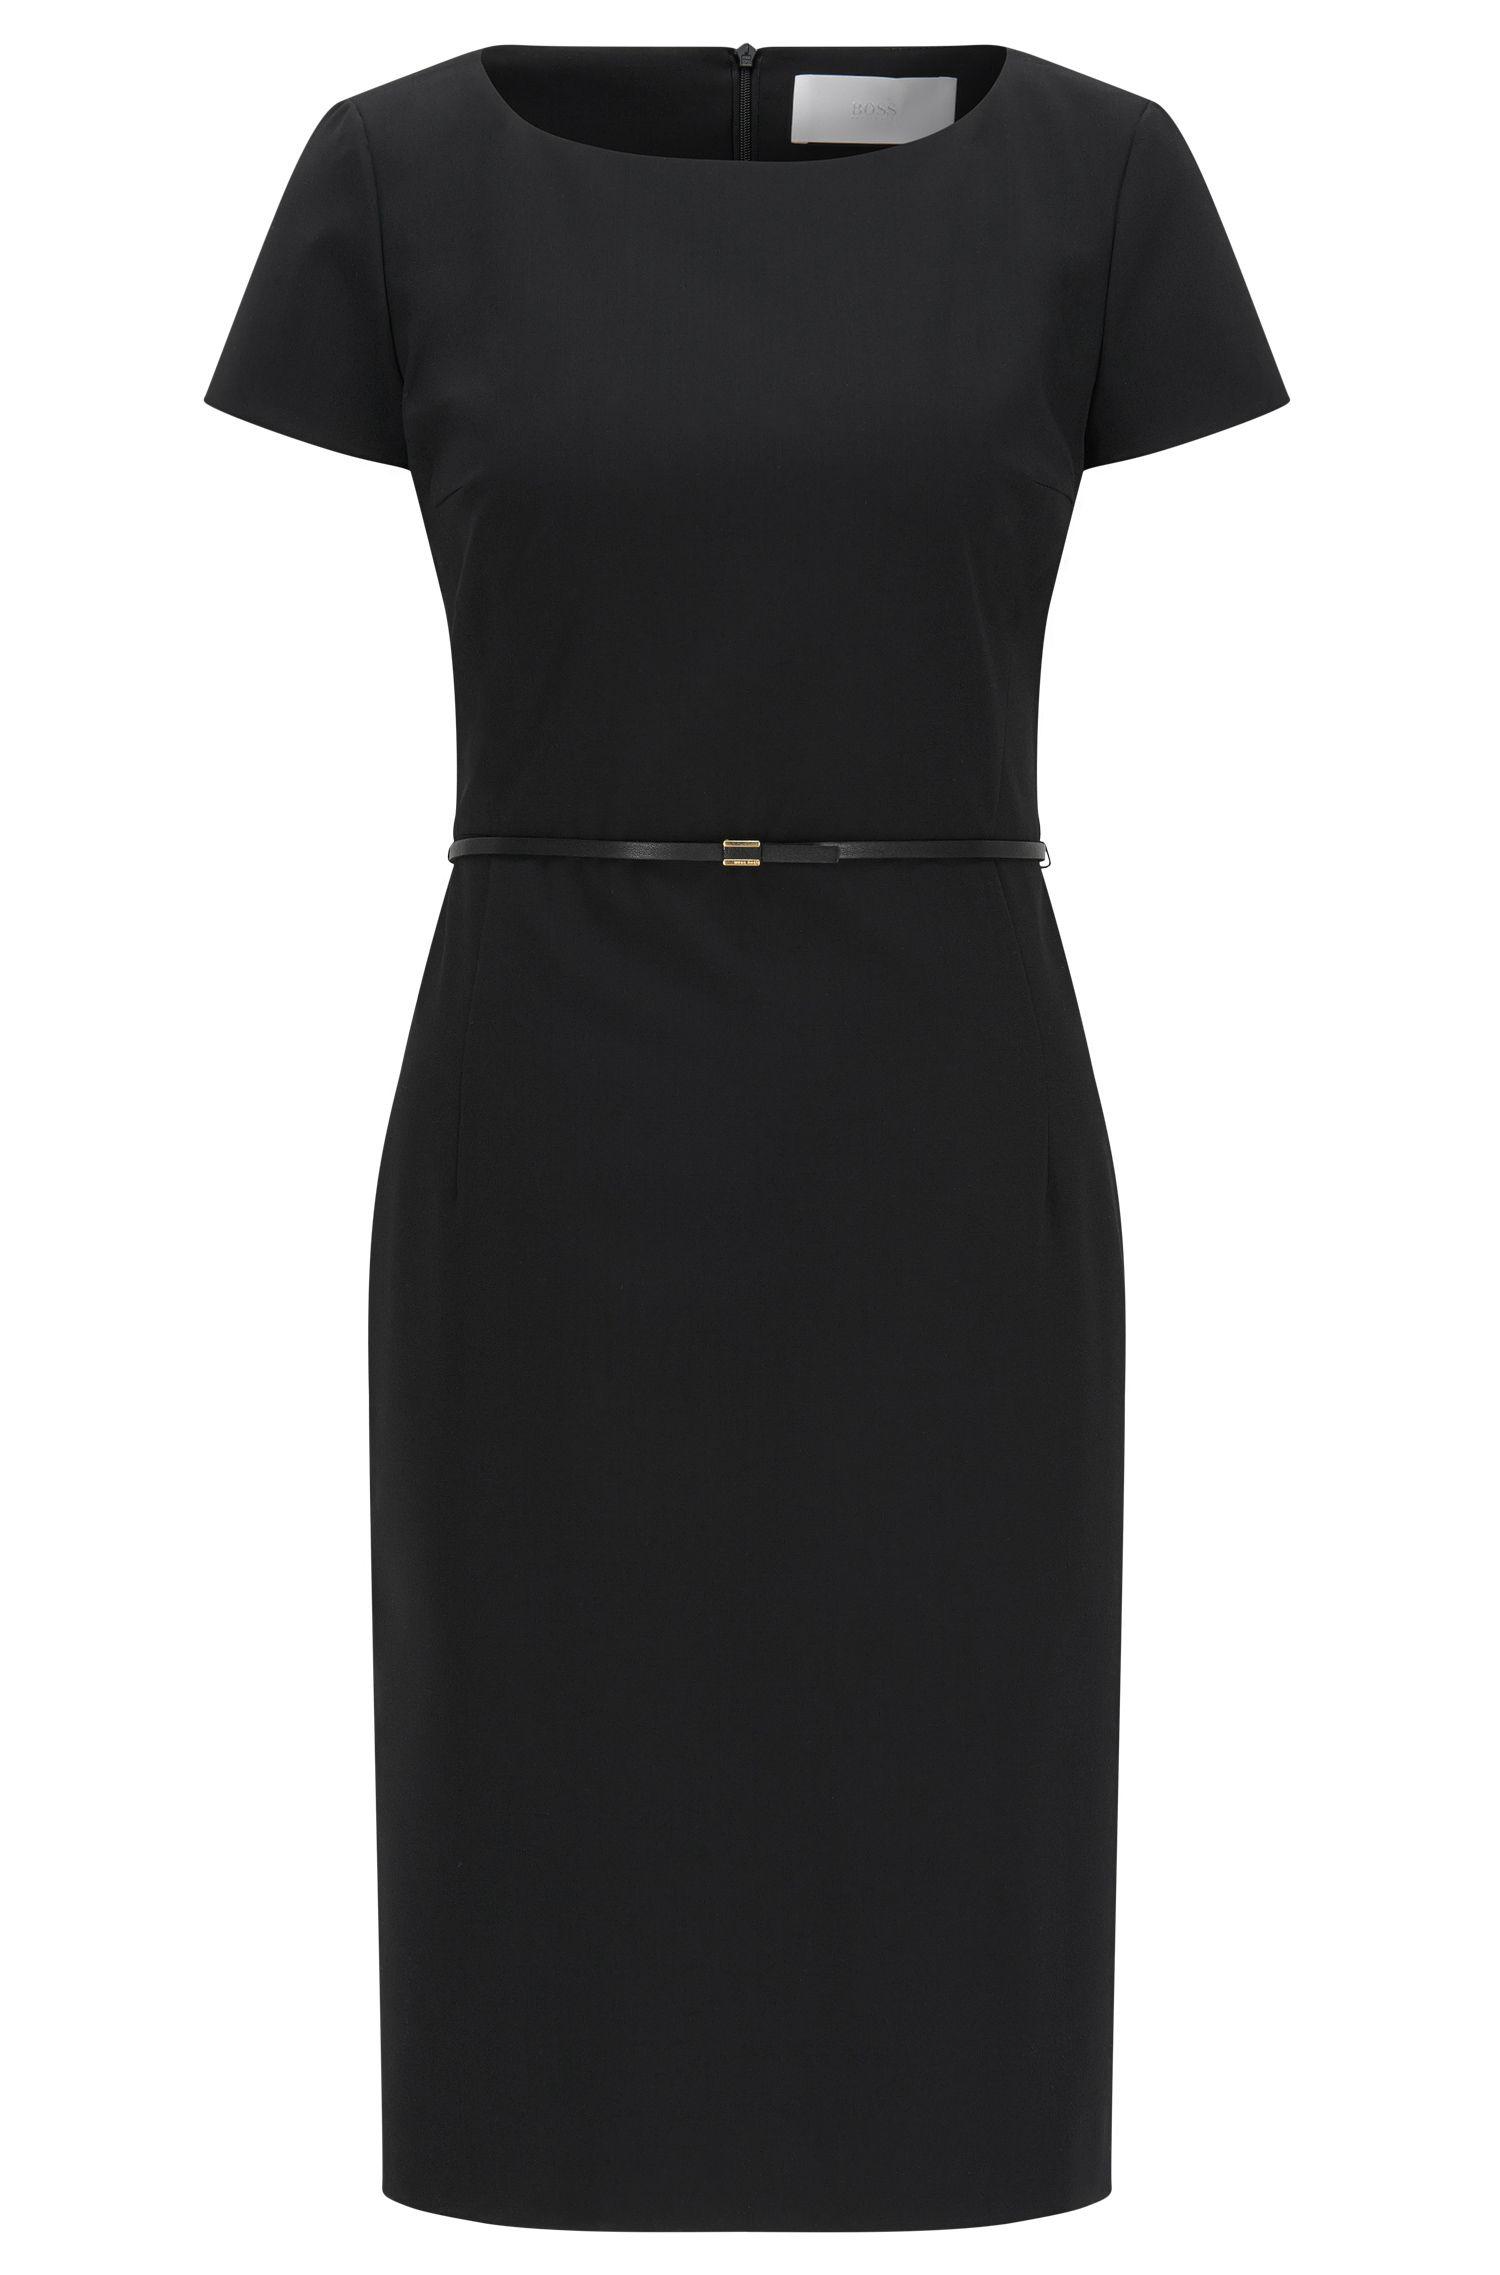 Vestido recto de lana elástica con cintura entallada